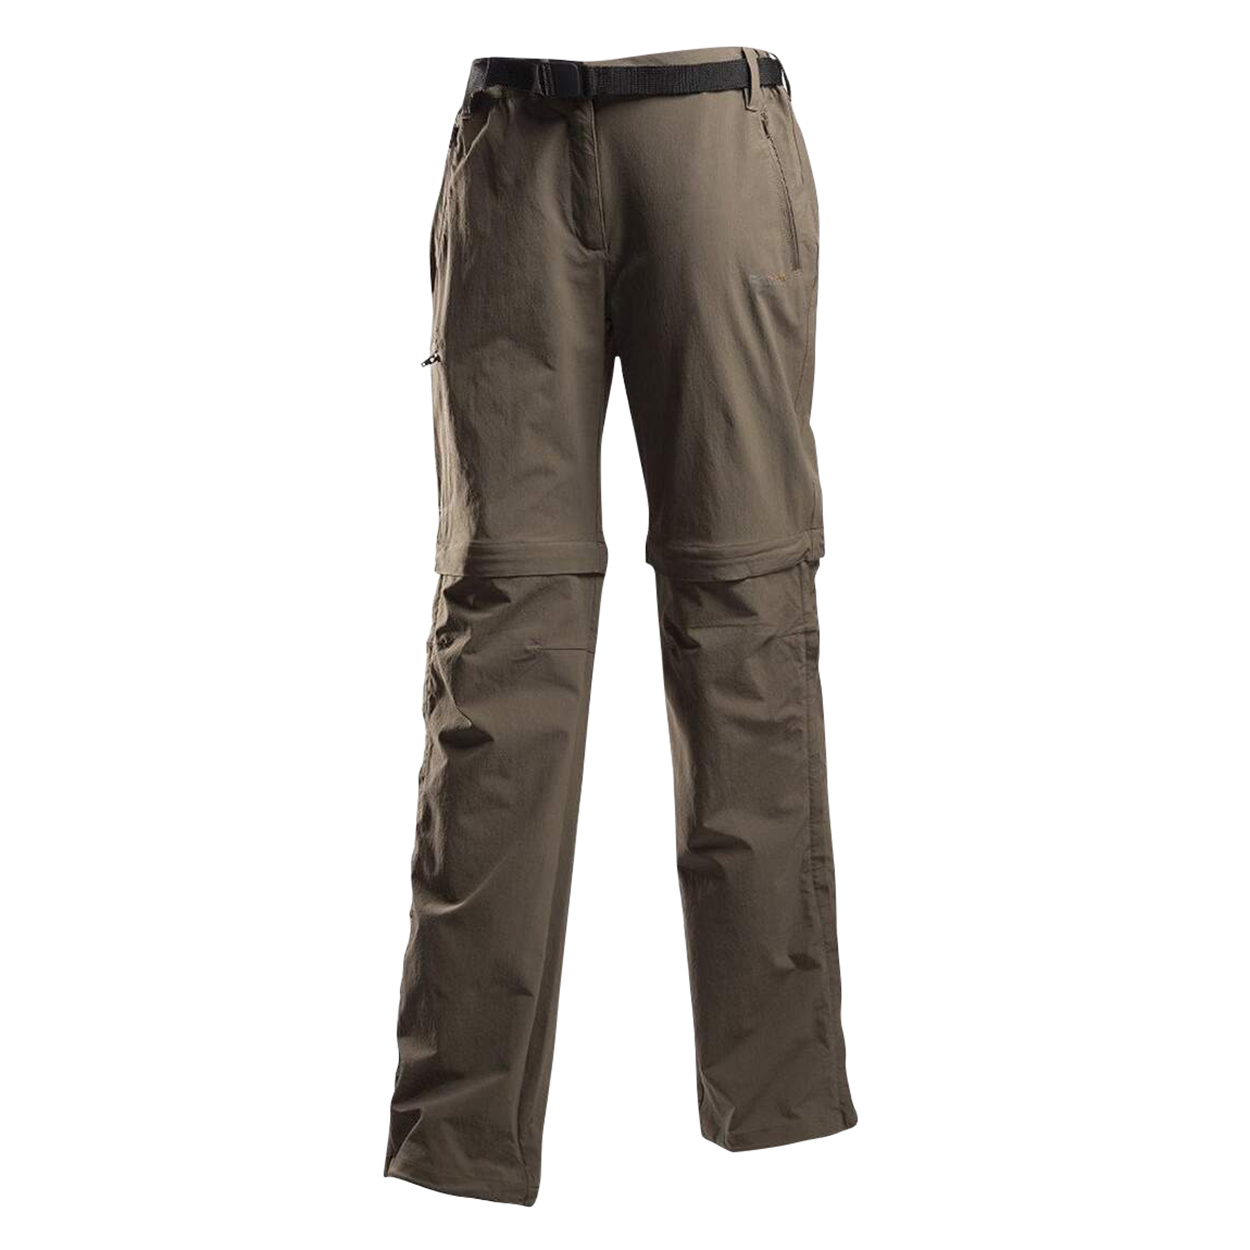 Regatta Great Outdoors Womens/Ladies Xert II Quick Drying Convertible Walking Trousers (30L) (Roasted)